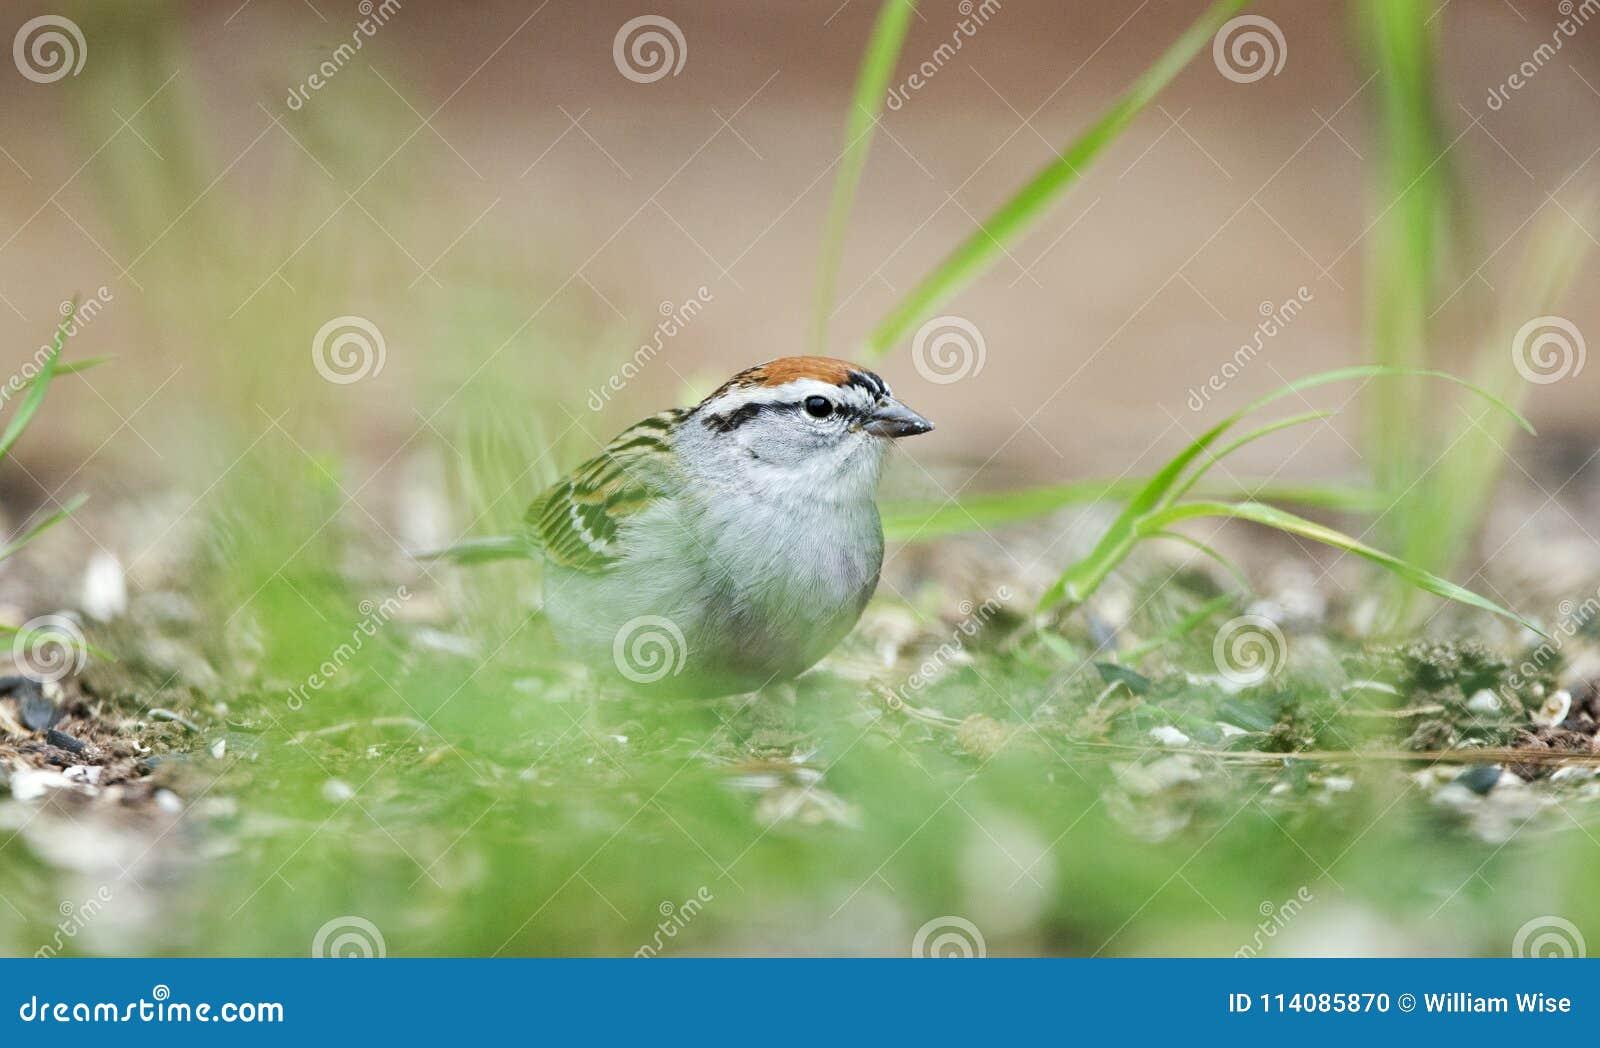 Pássaro do pardal lascando-se que come sementes na grama, Atenas GA, EUA